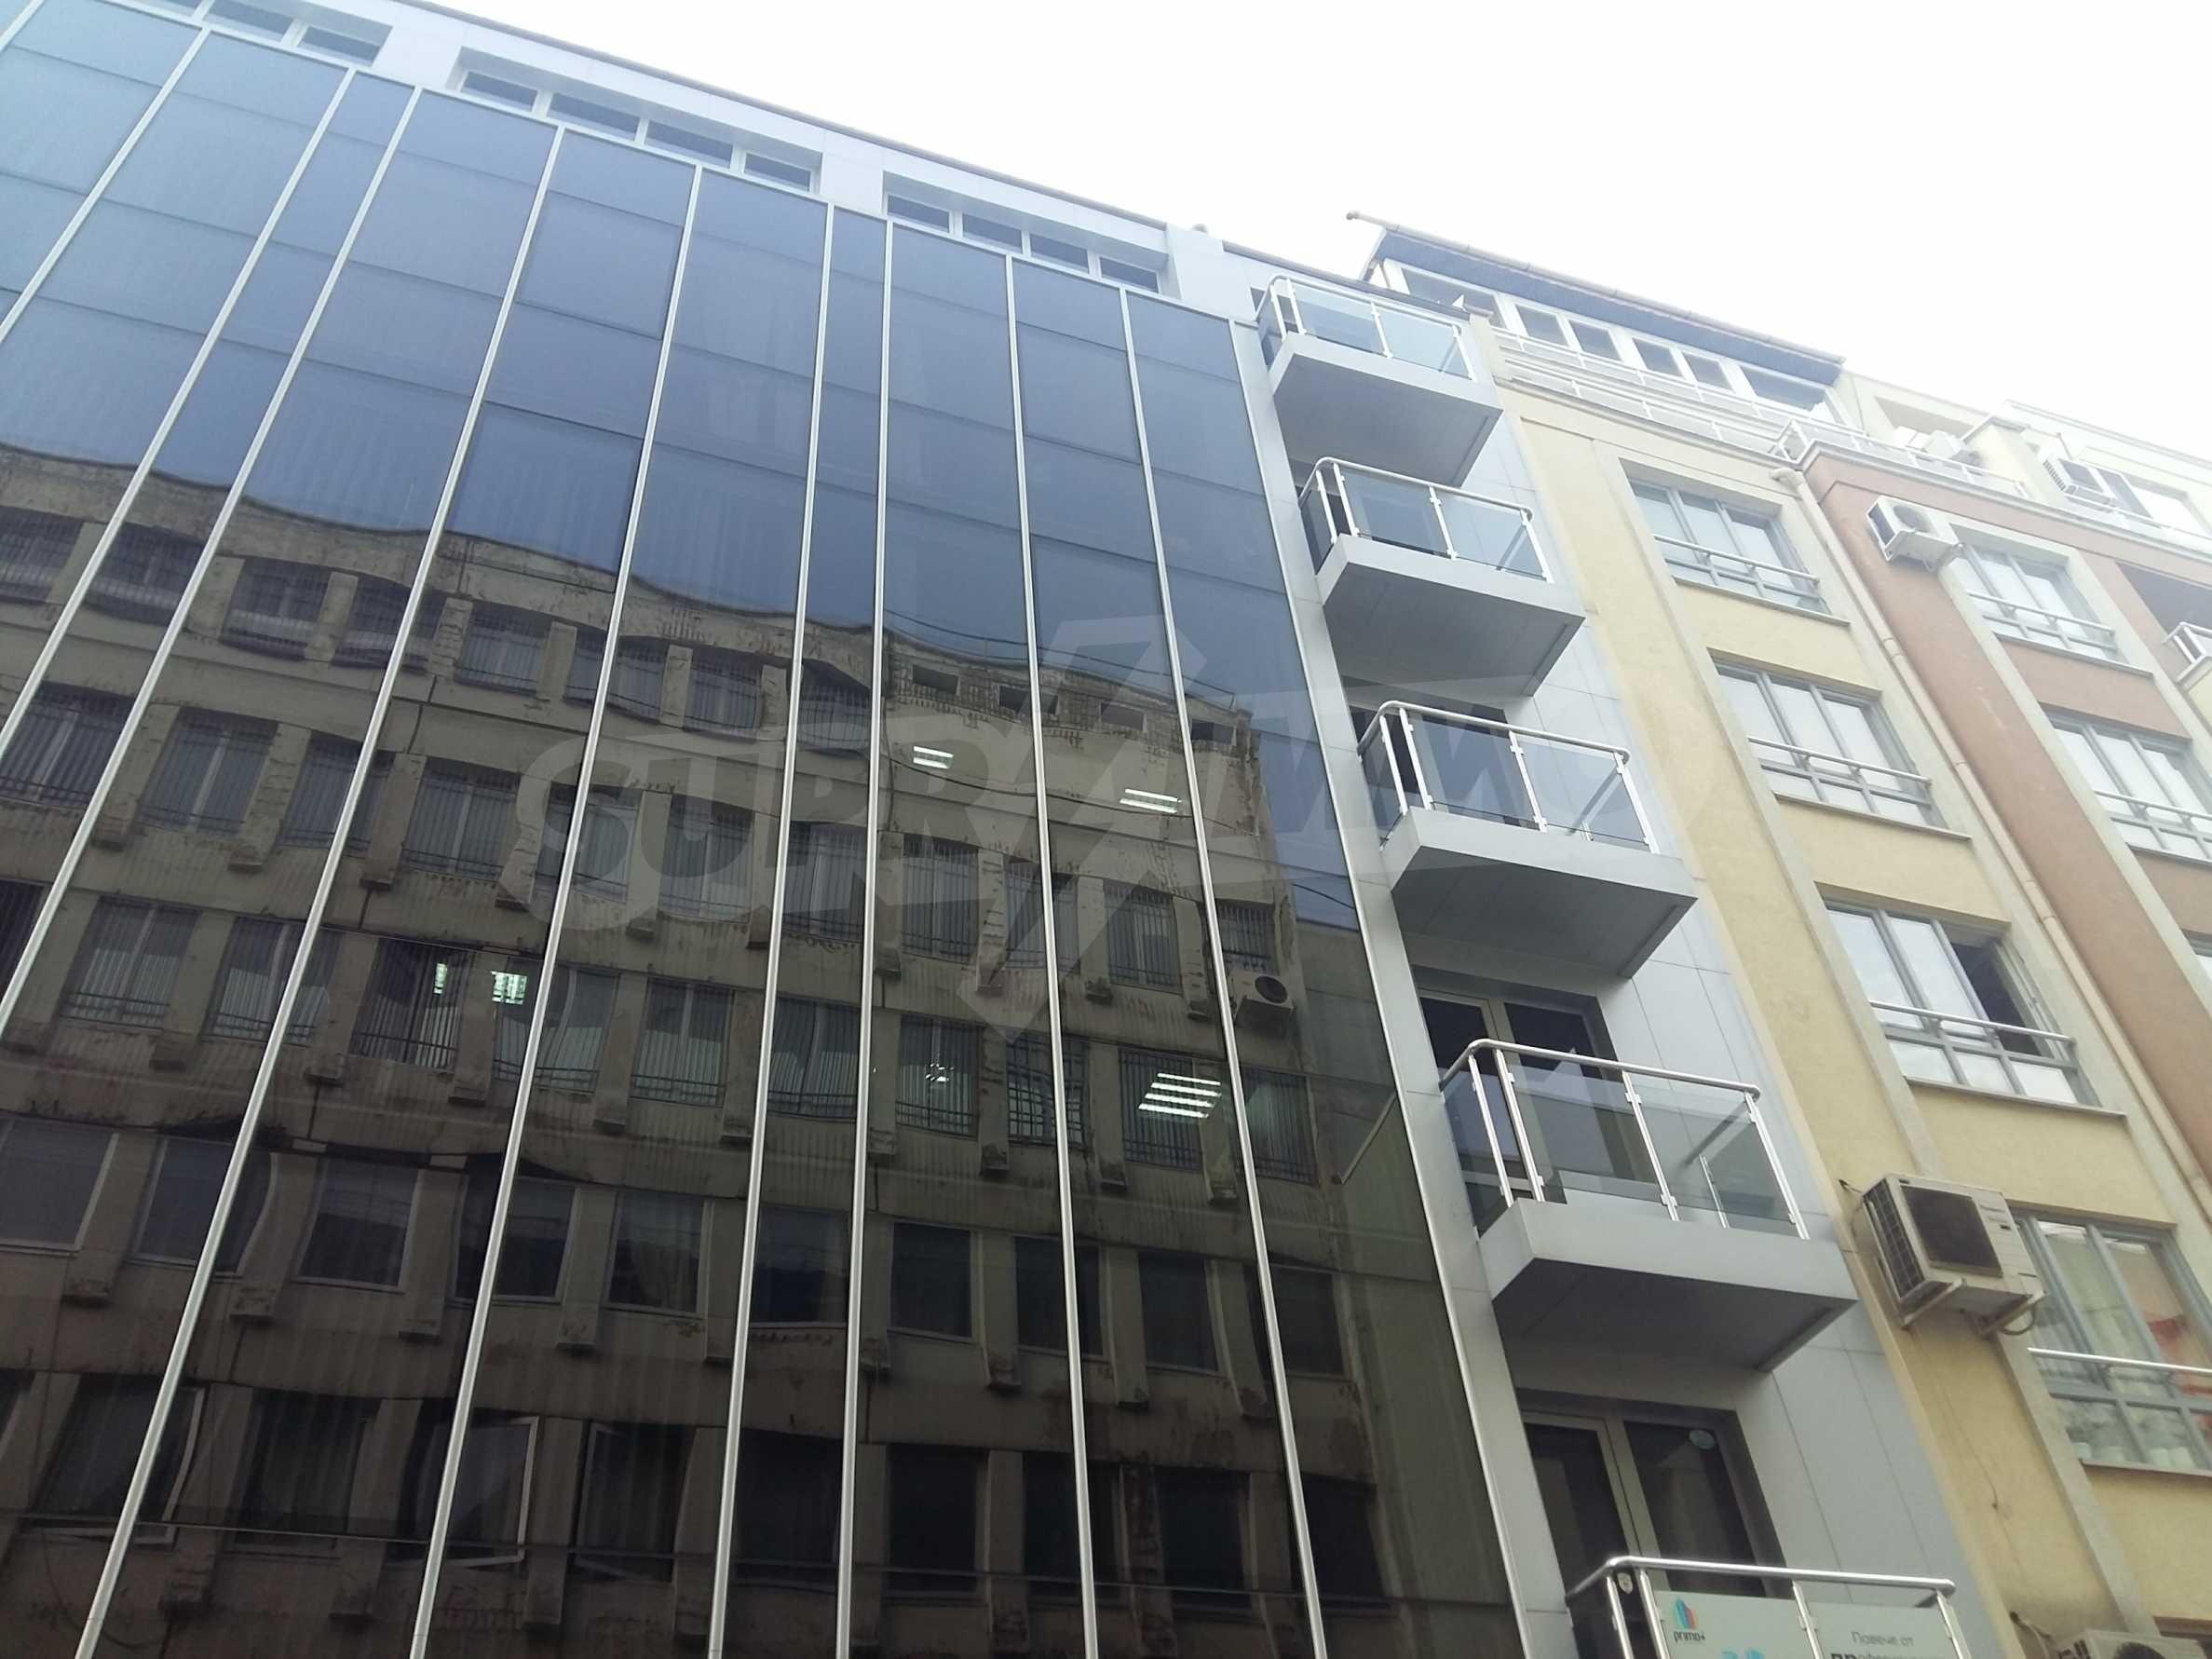 Офис в нова сграда близо до метростанция  2